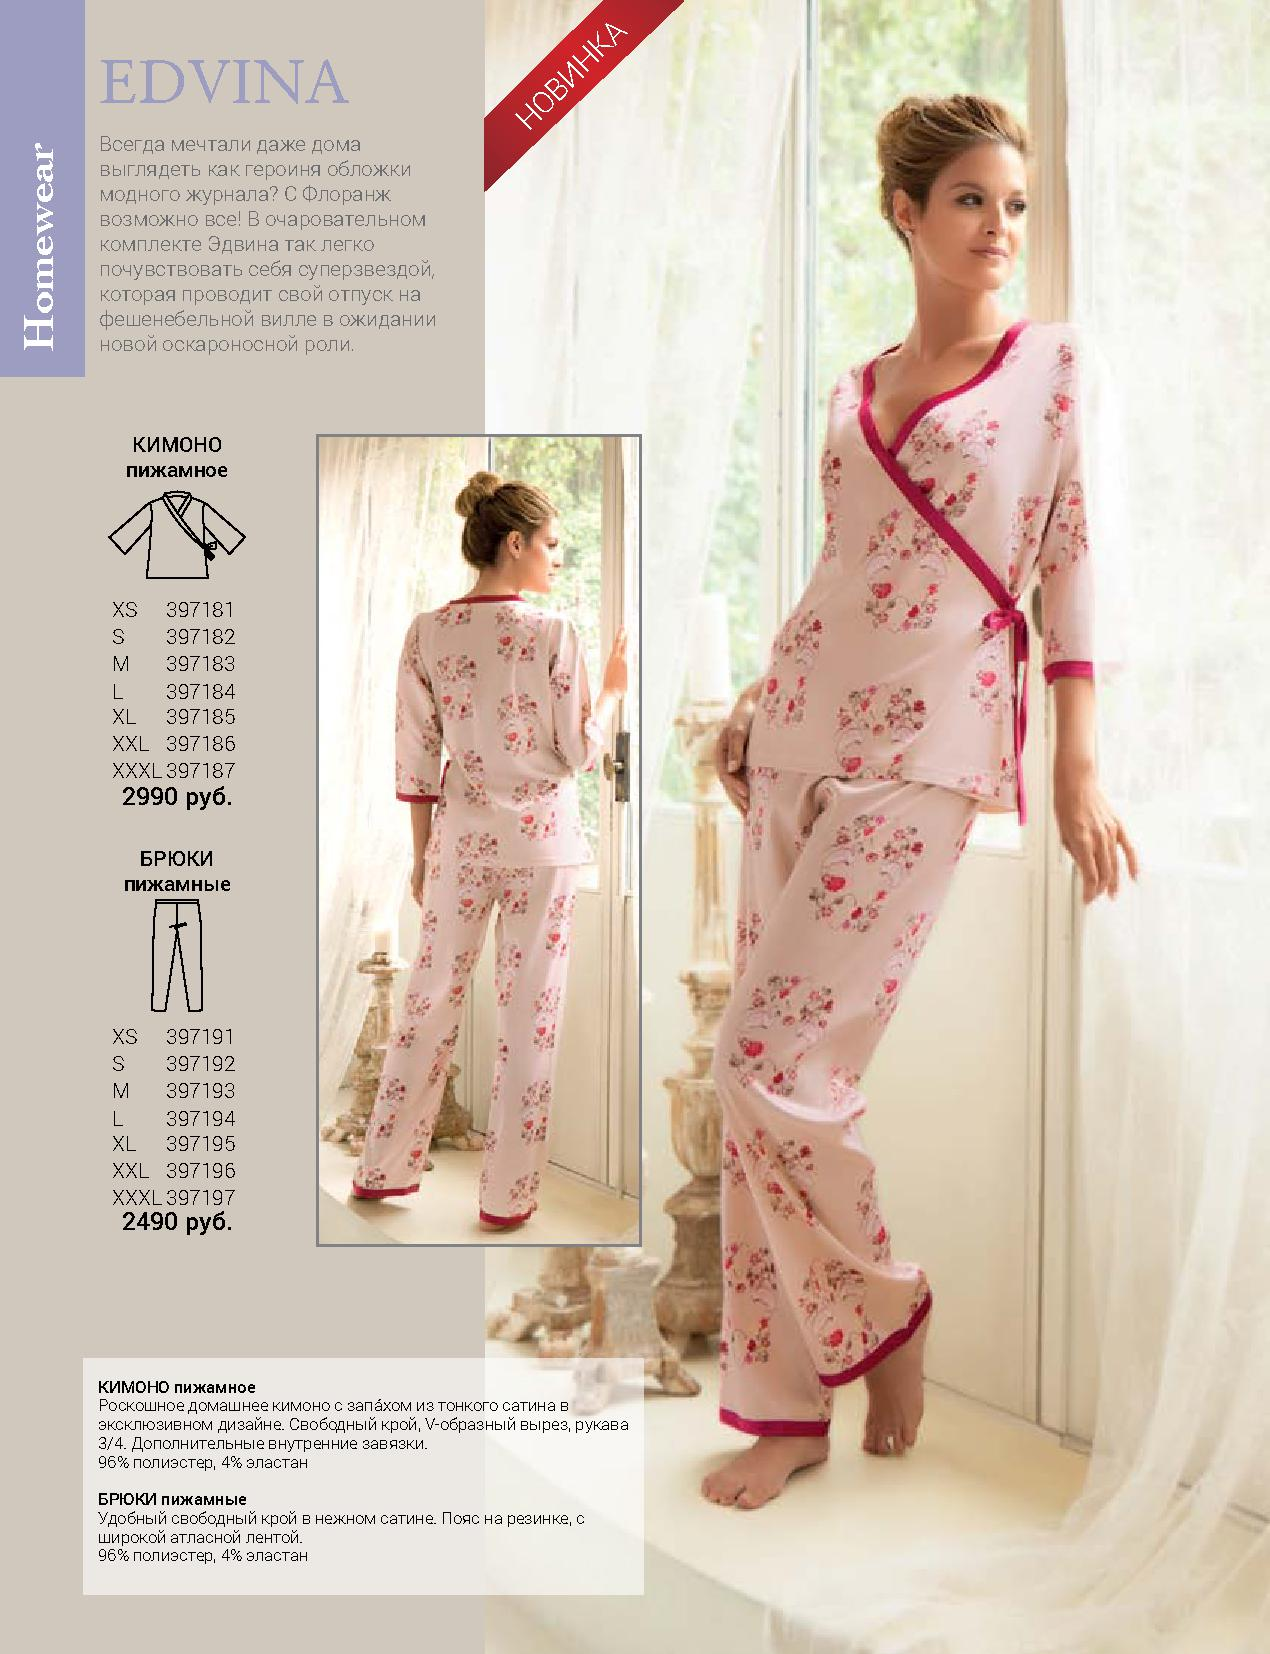 Флоранж - комплект Эдвина - кимоно и брюки